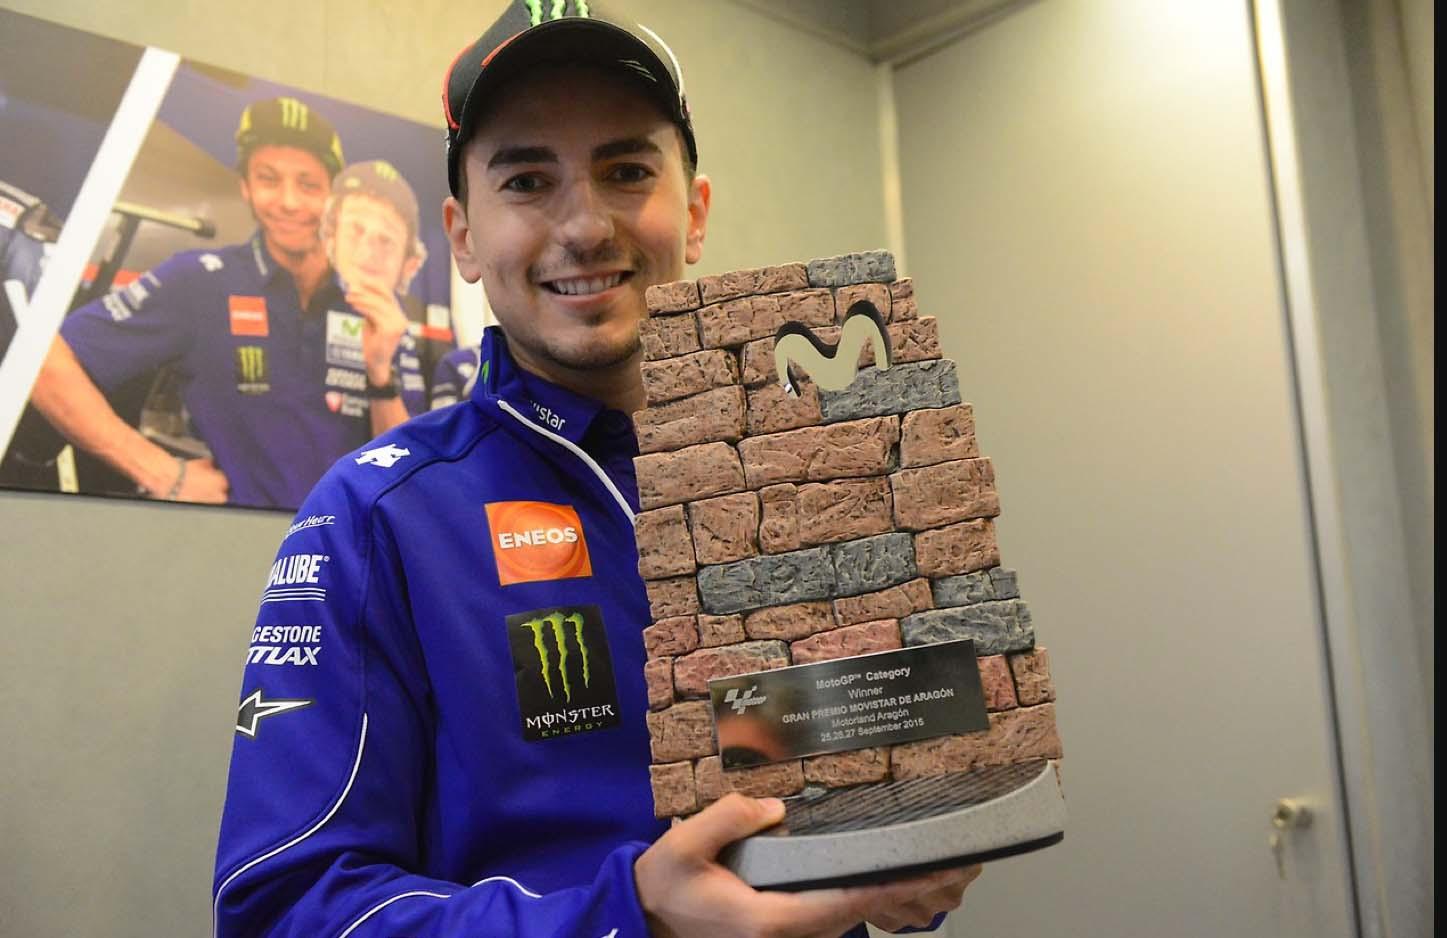 Хорхе Лоренсо (приз победителю Гран-При Арагона)